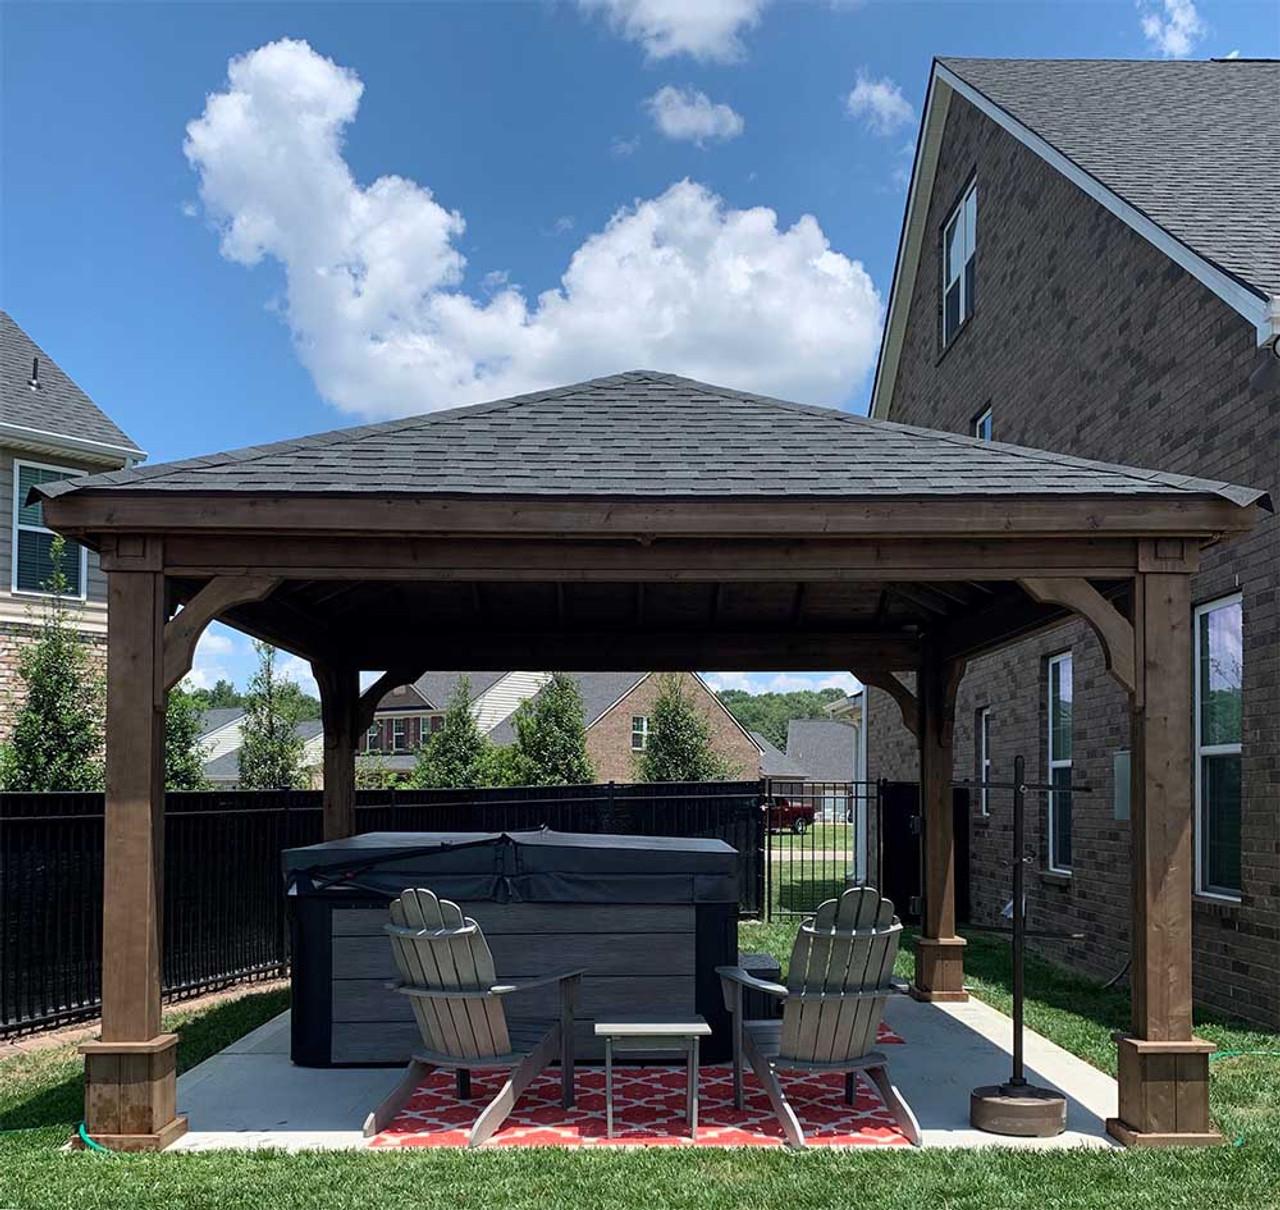 14x14 Cedar Traditional (Hip) Pavilion Murfreesboro TN